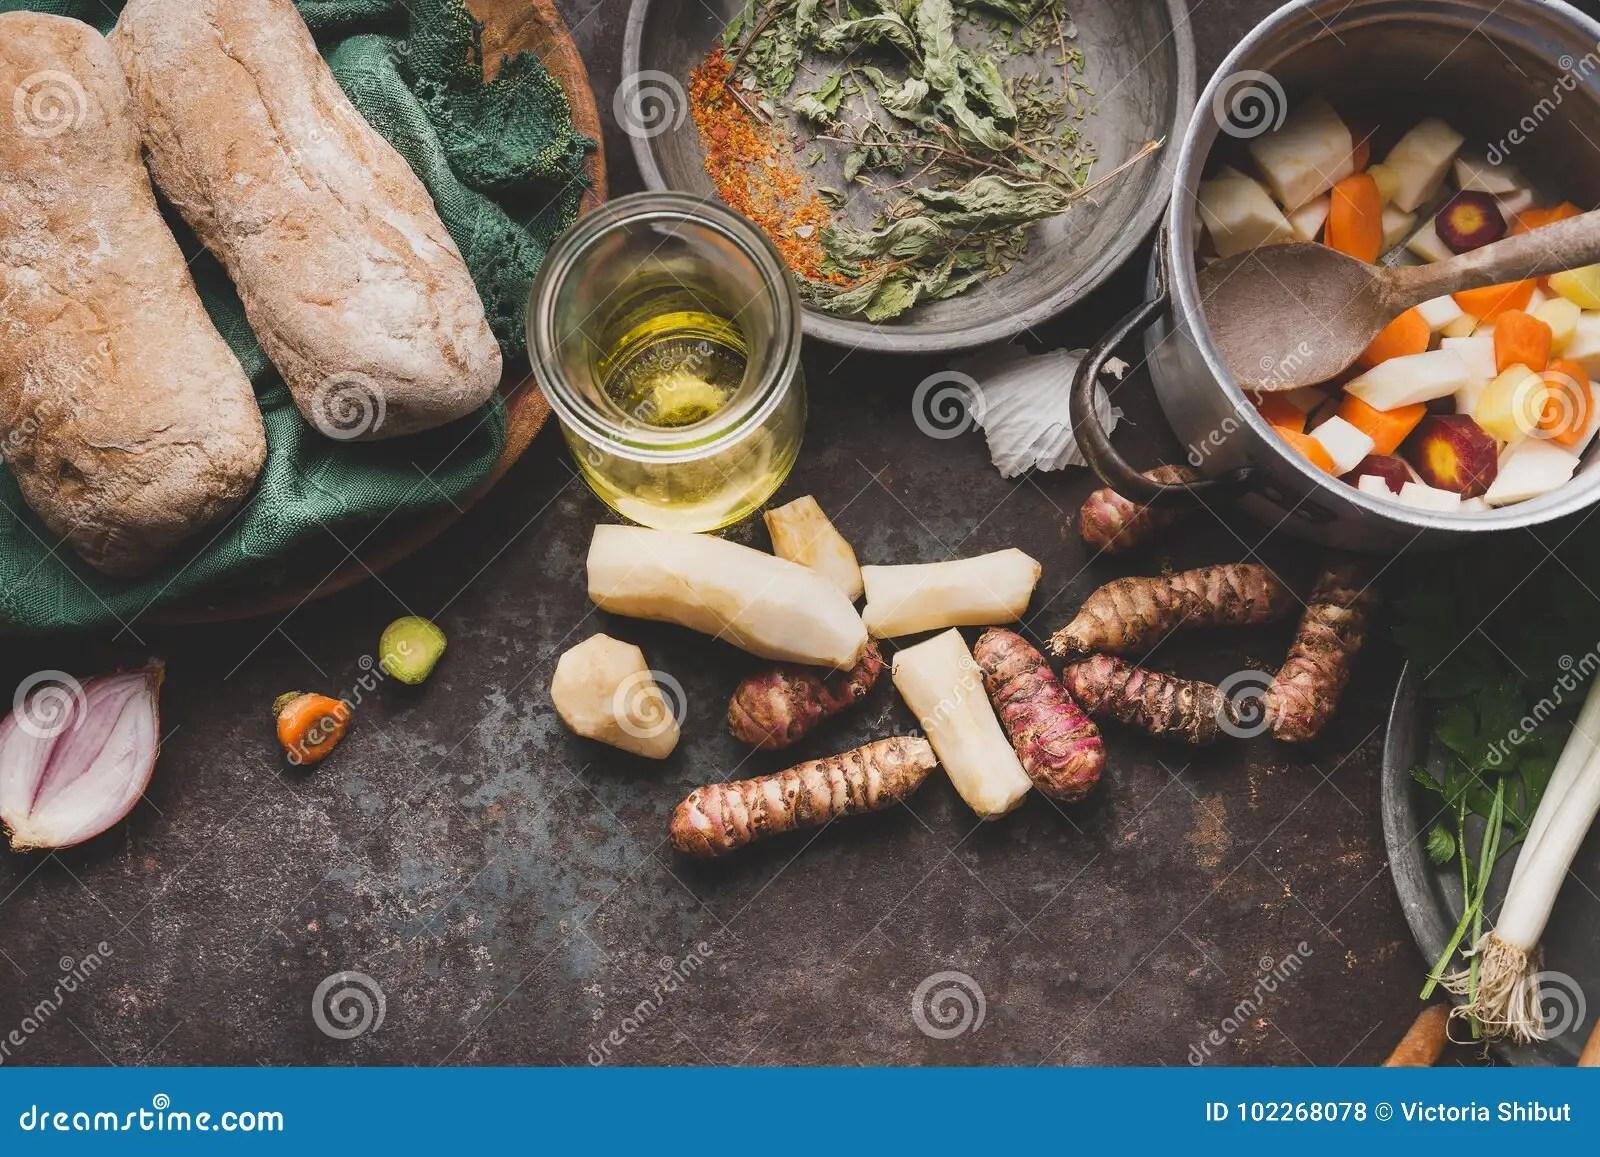 kitchen prep table kitchens with granite countertops 烹调在土气厨房用桌上的洋姜准备与罐 切成小方块的菜 油和成份库存照片 切成